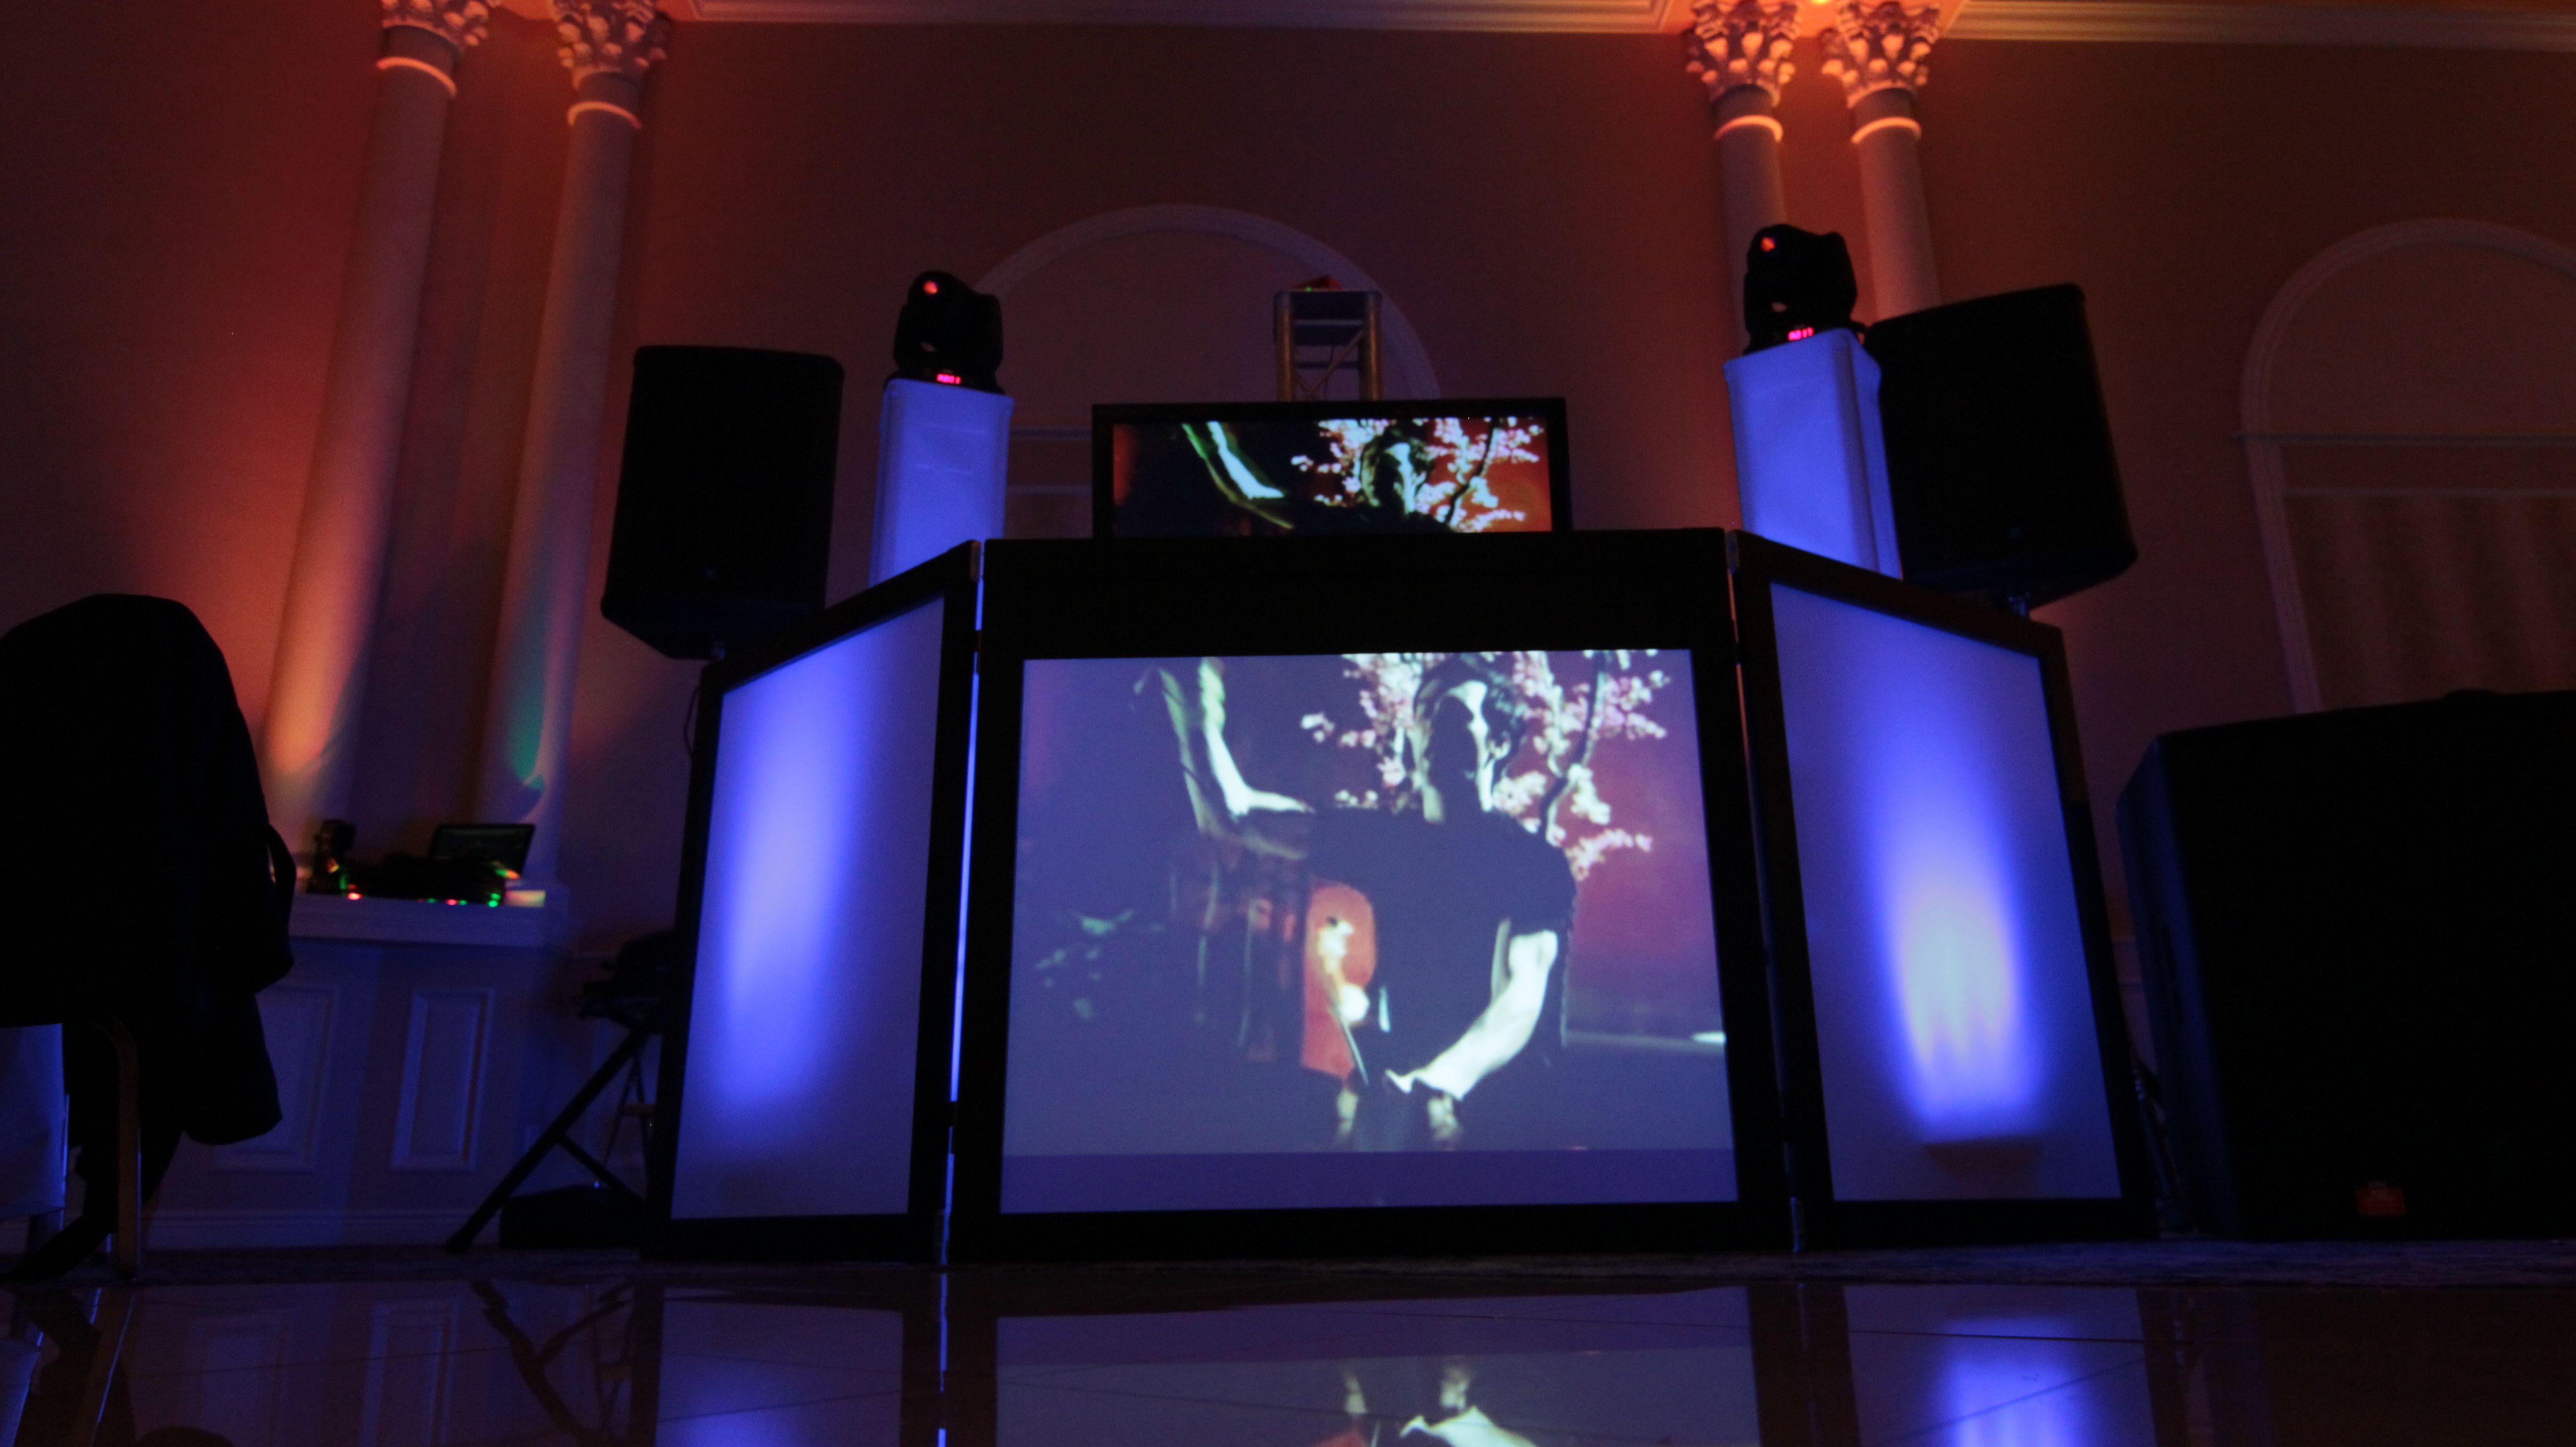 dj booth wedding corporate dj setups lighting allgenerationsdj dj booth dj equipment. Black Bedroom Furniture Sets. Home Design Ideas